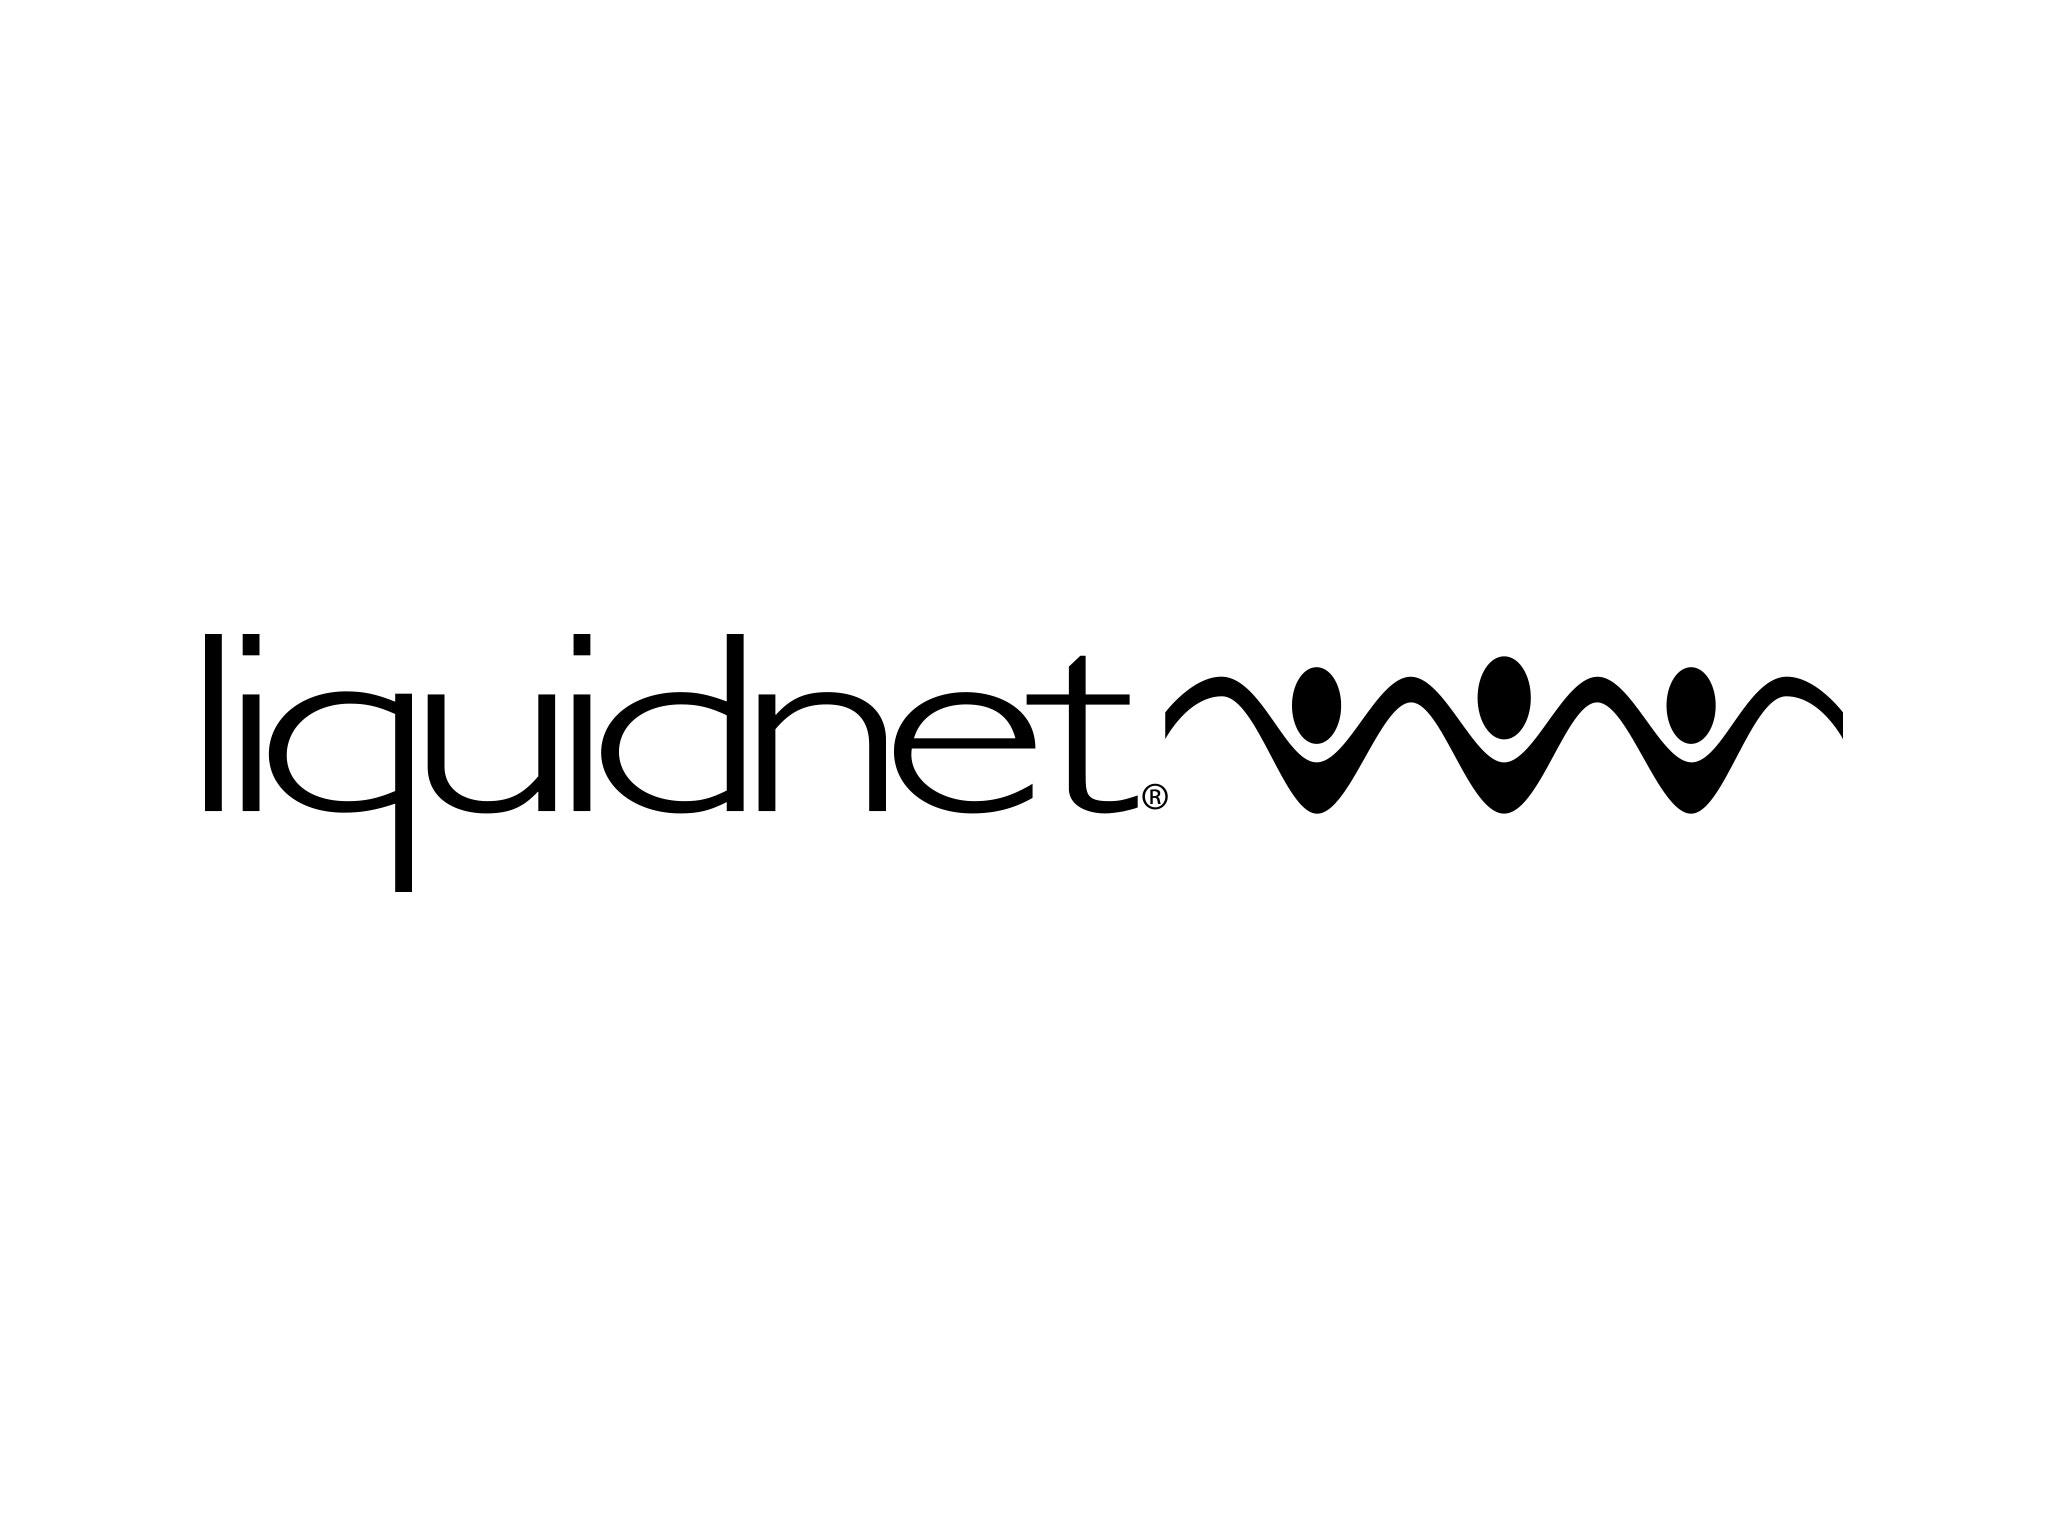 HIERONYMUS_Liquidnet-Logo_Old